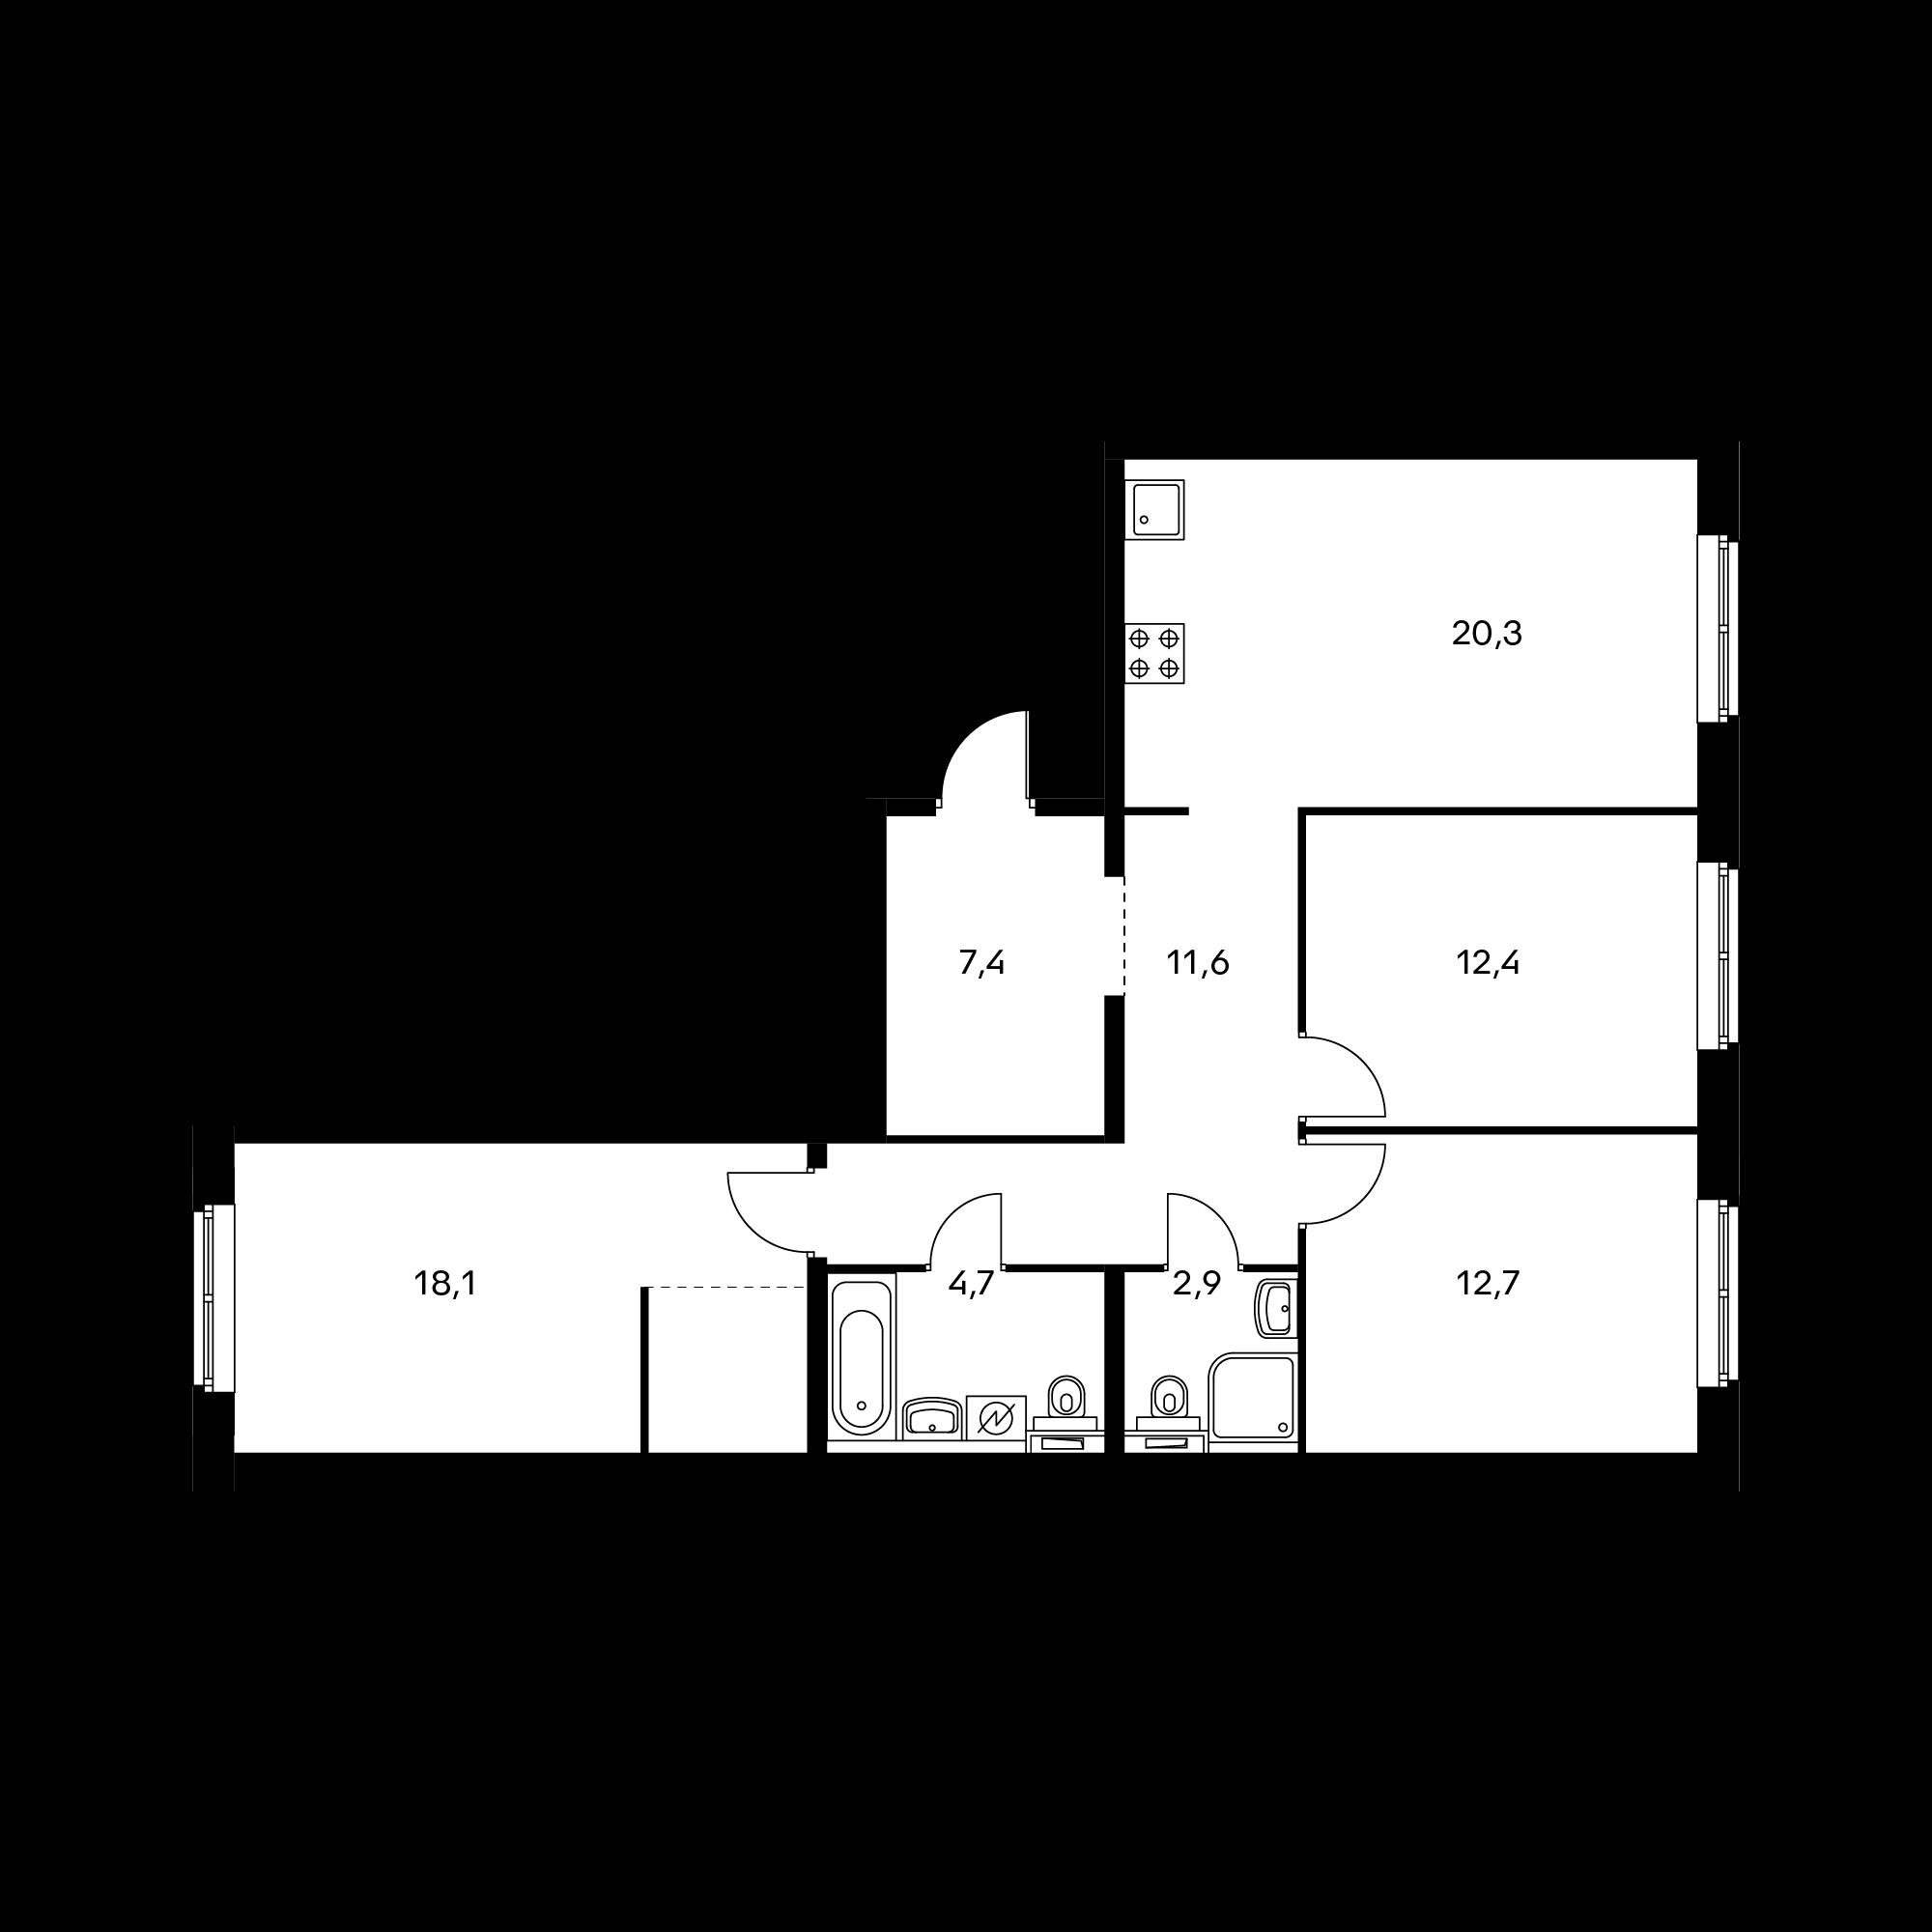 3EL3_10.2-6